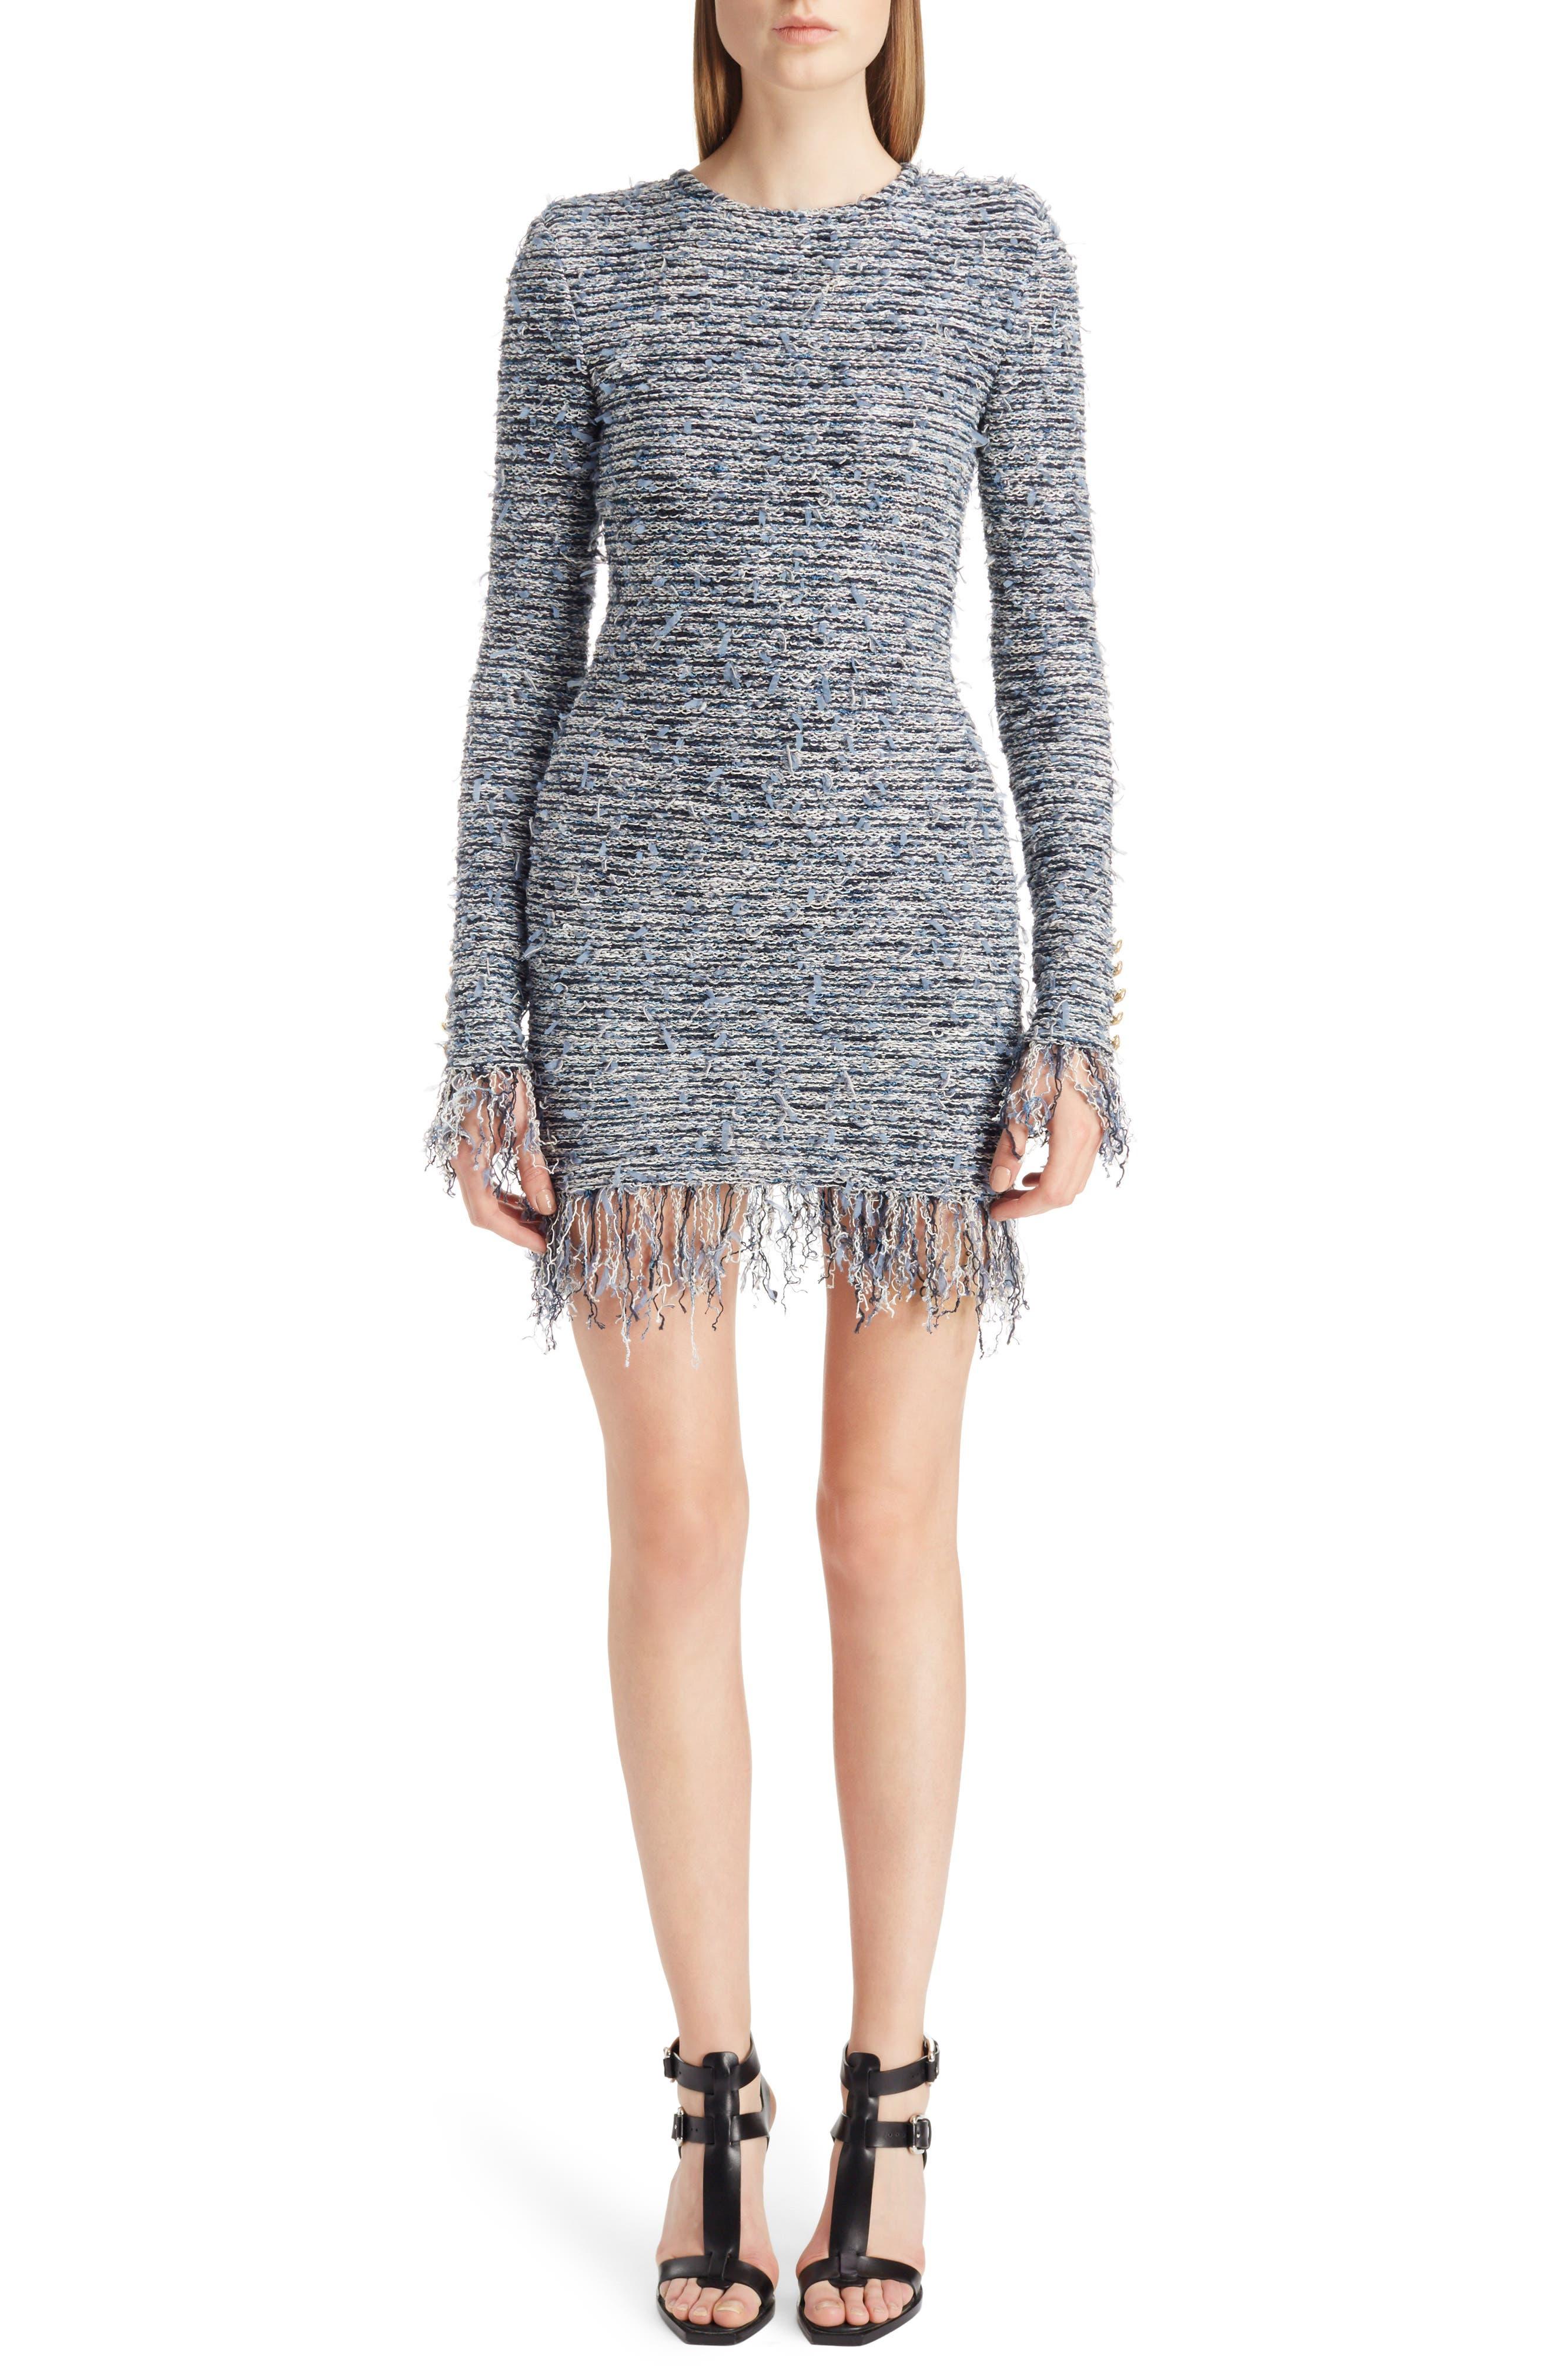 Balmain Fringe Tweed Minidress